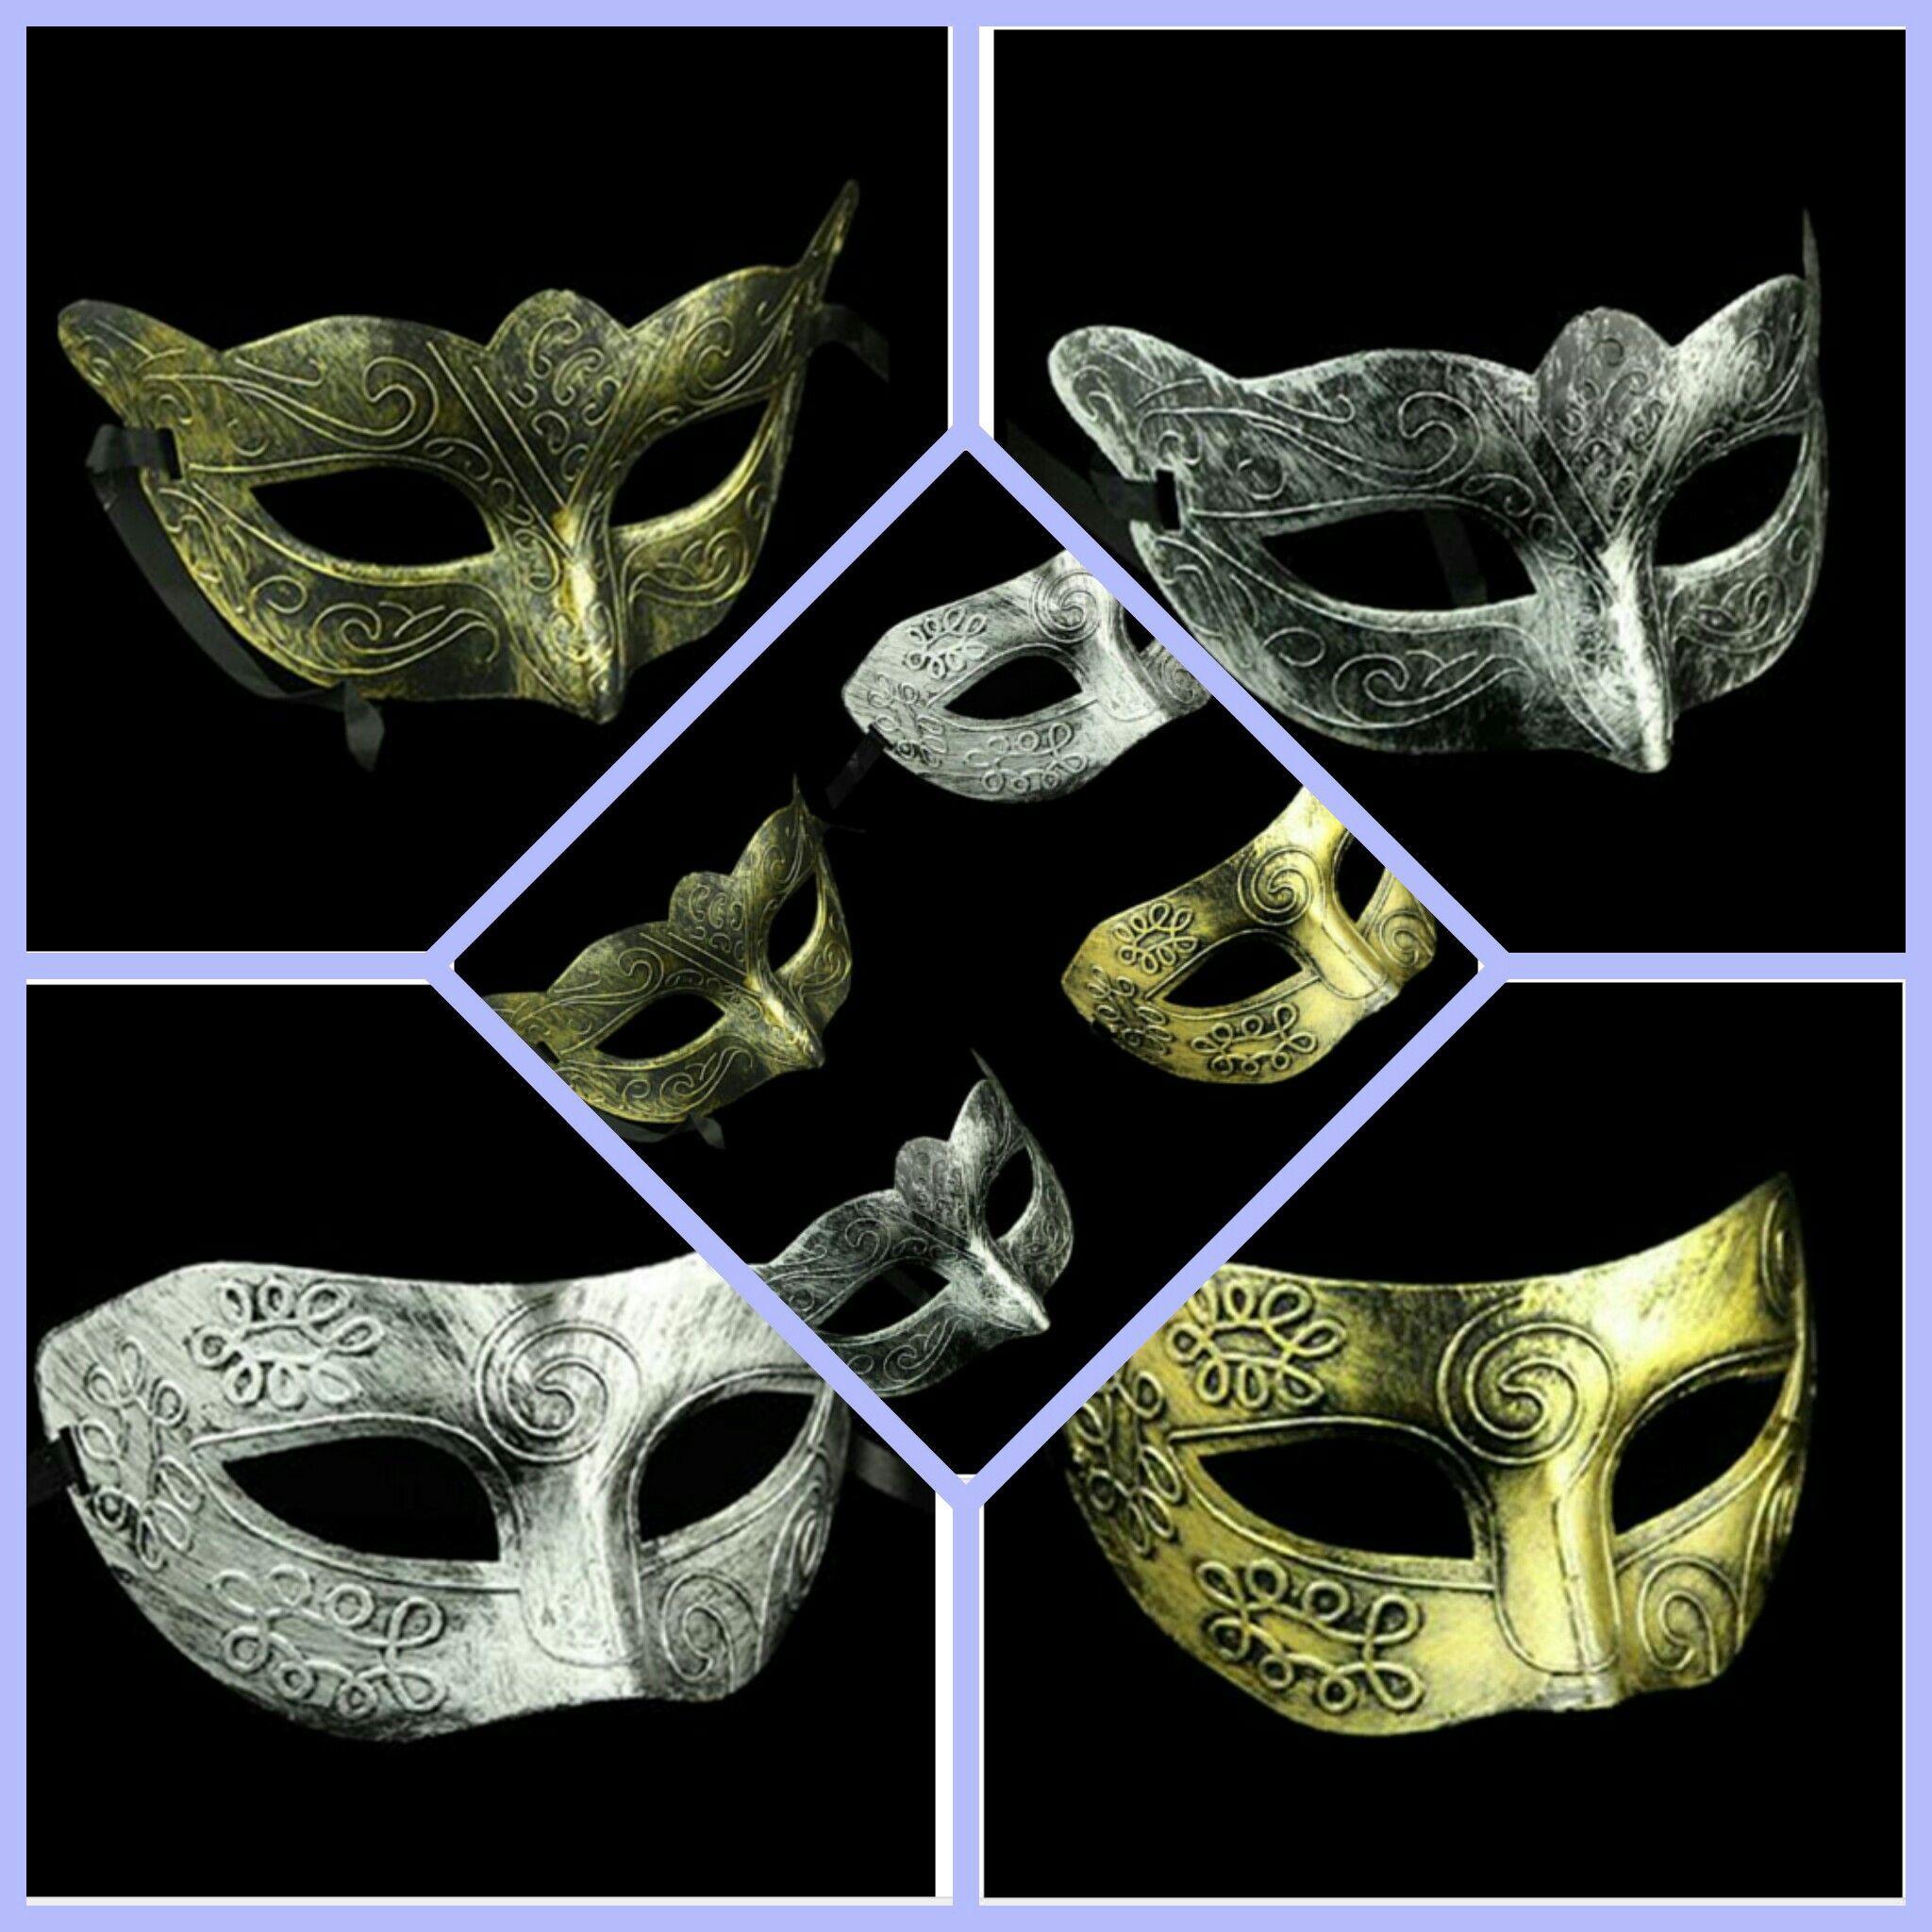 4d5ca2a36c0e4 Retro Roman Prince Gold/ Silver Mask Repli Jazz Man Mask At Masquerade  Silver Carnival Halloween Vintage Half Face Mask WL02 Masked Ball Costumes  Masked ...